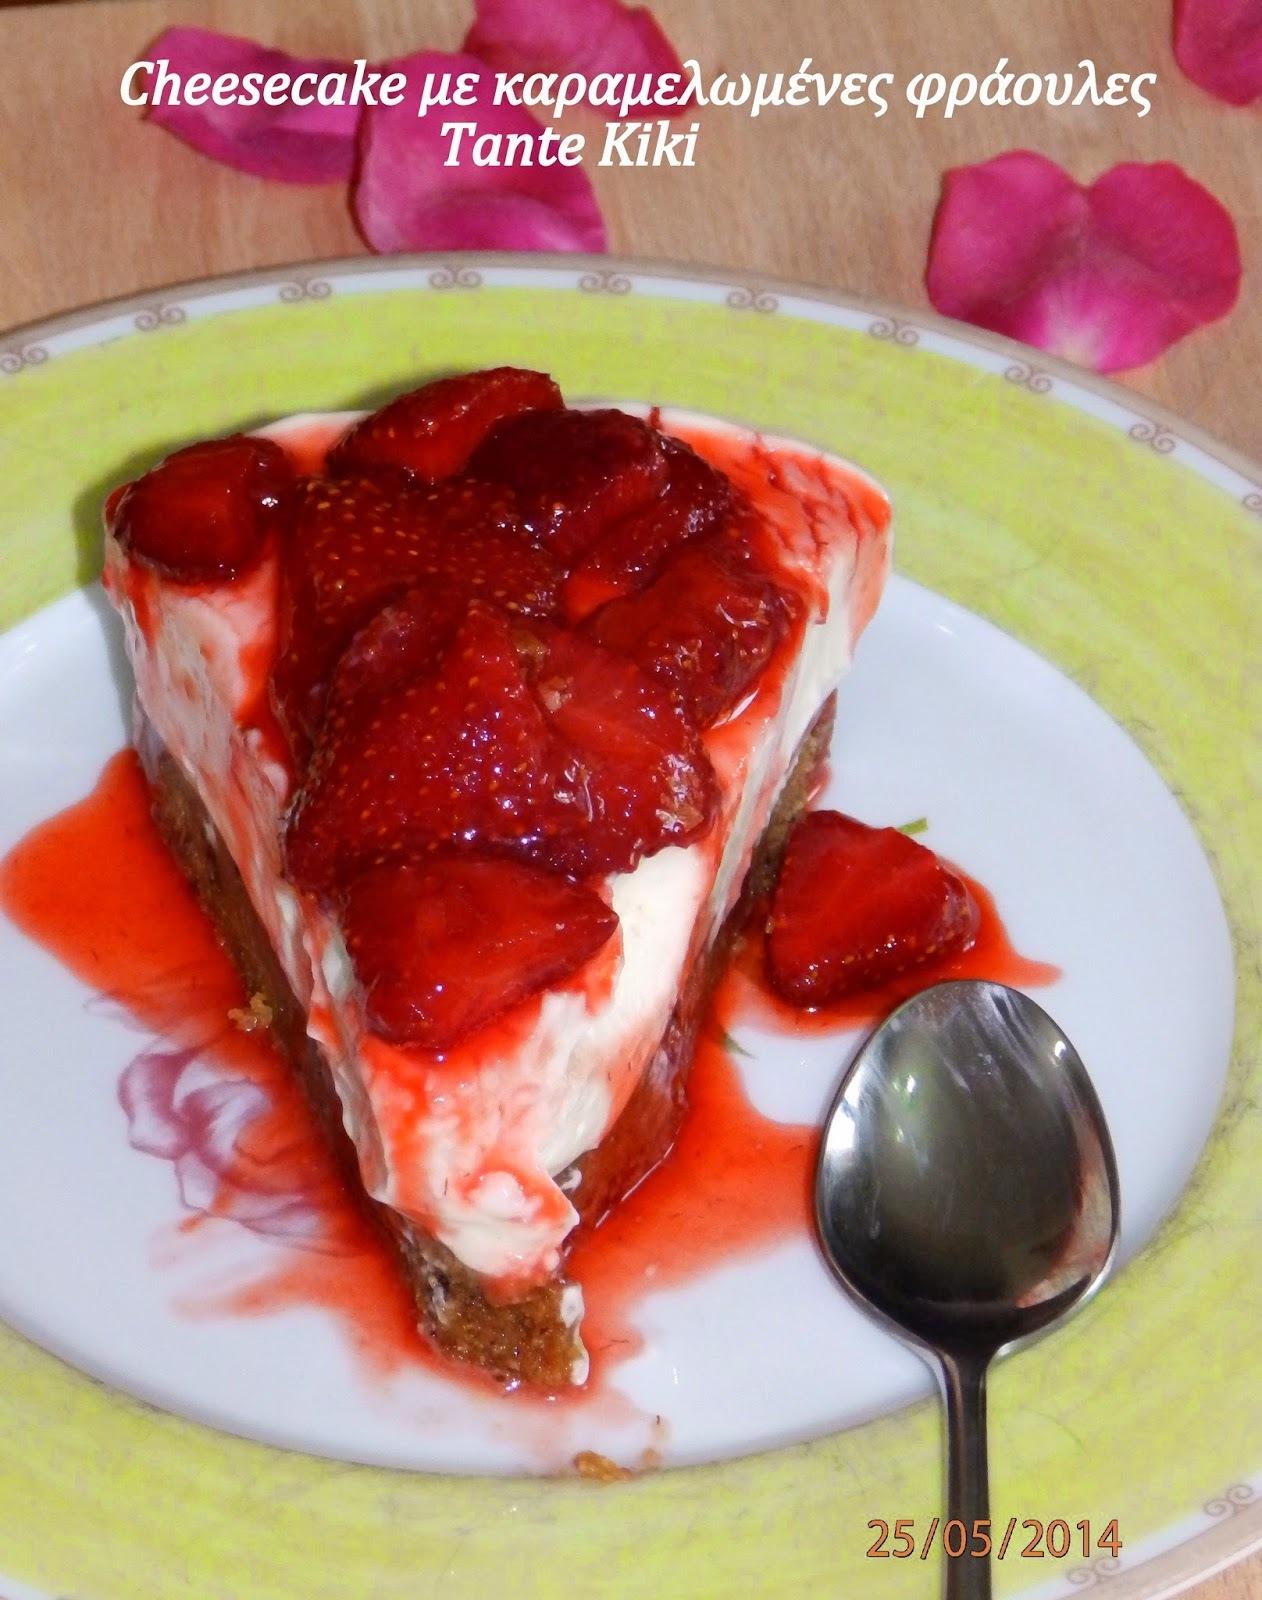 Cheesecake με crème fraîche και καραμελωμένες φράουλες